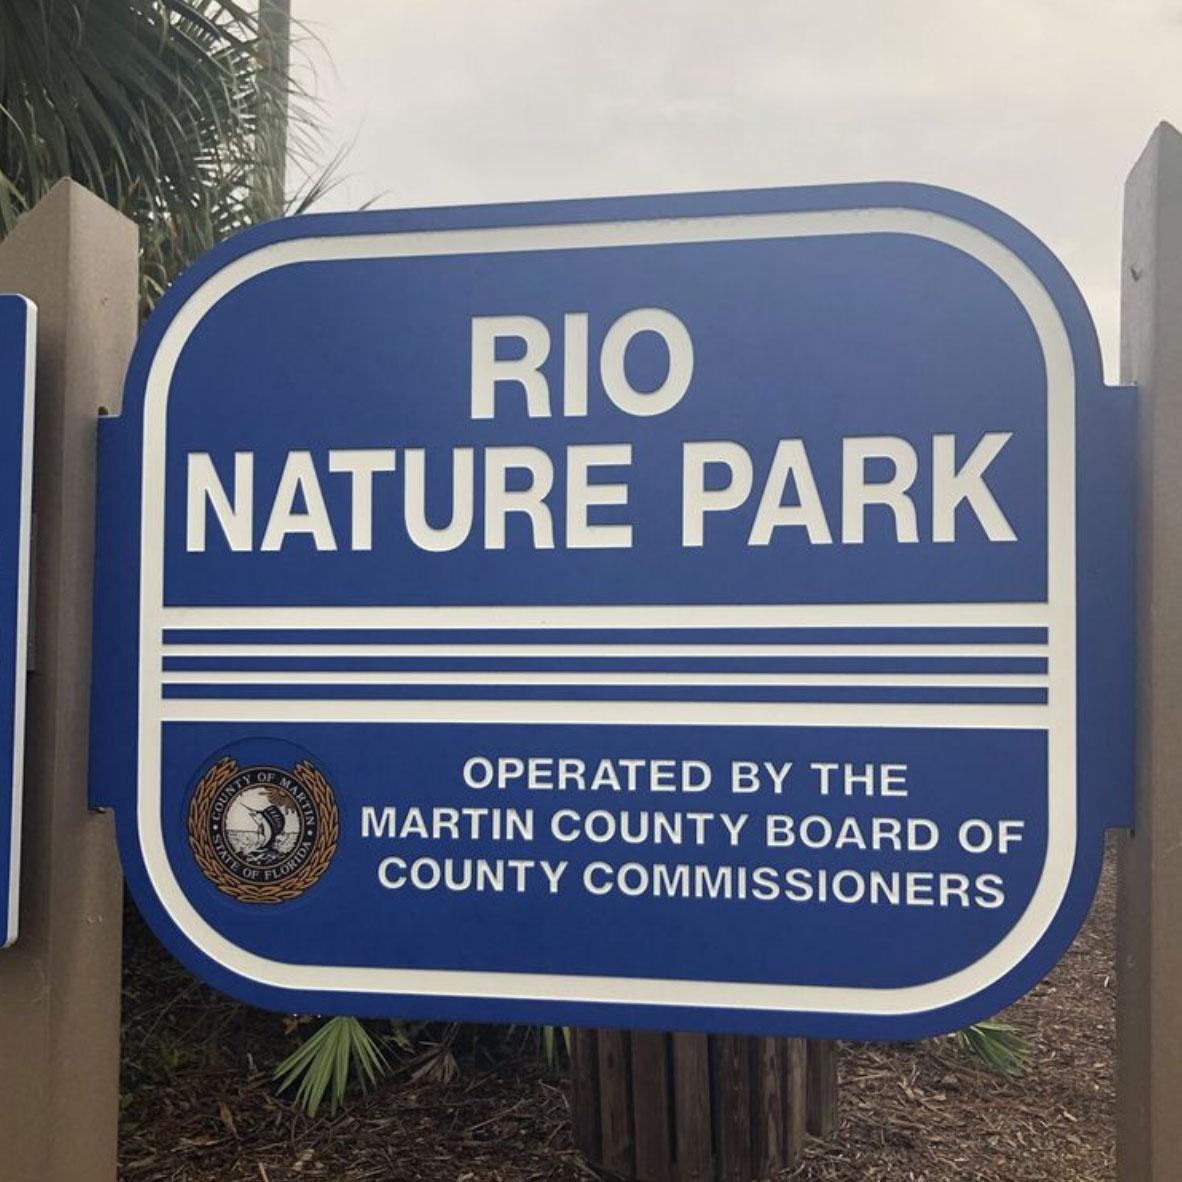 Rio Nature Park  Image